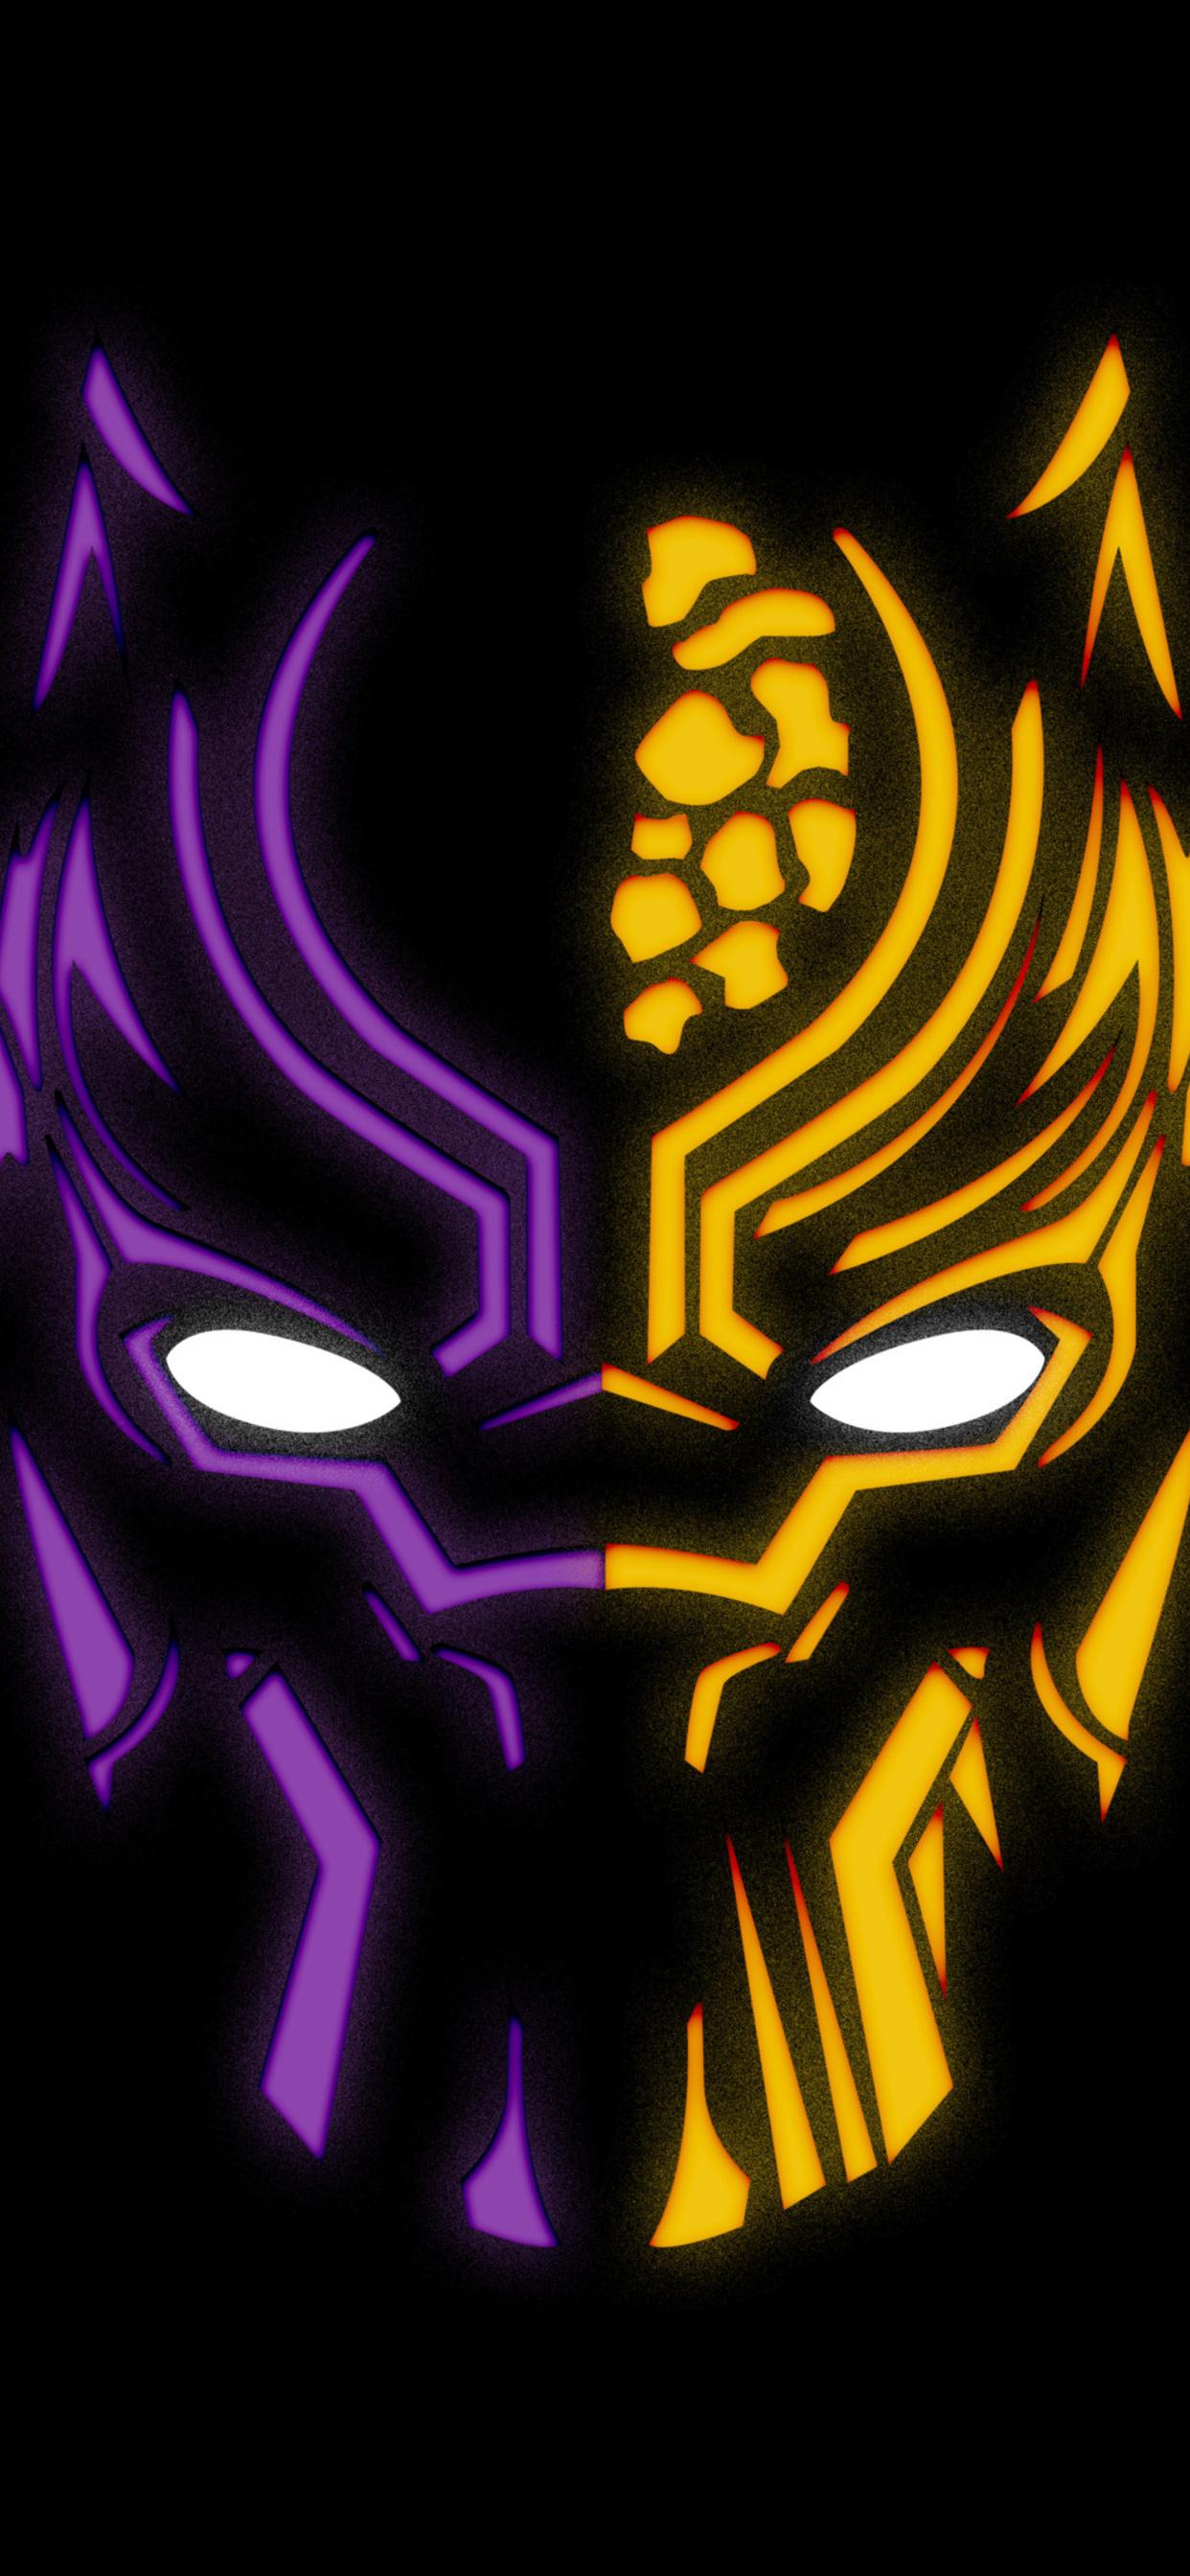 Black Panther Iphone Xs Max Wallpaper | Unixpaint